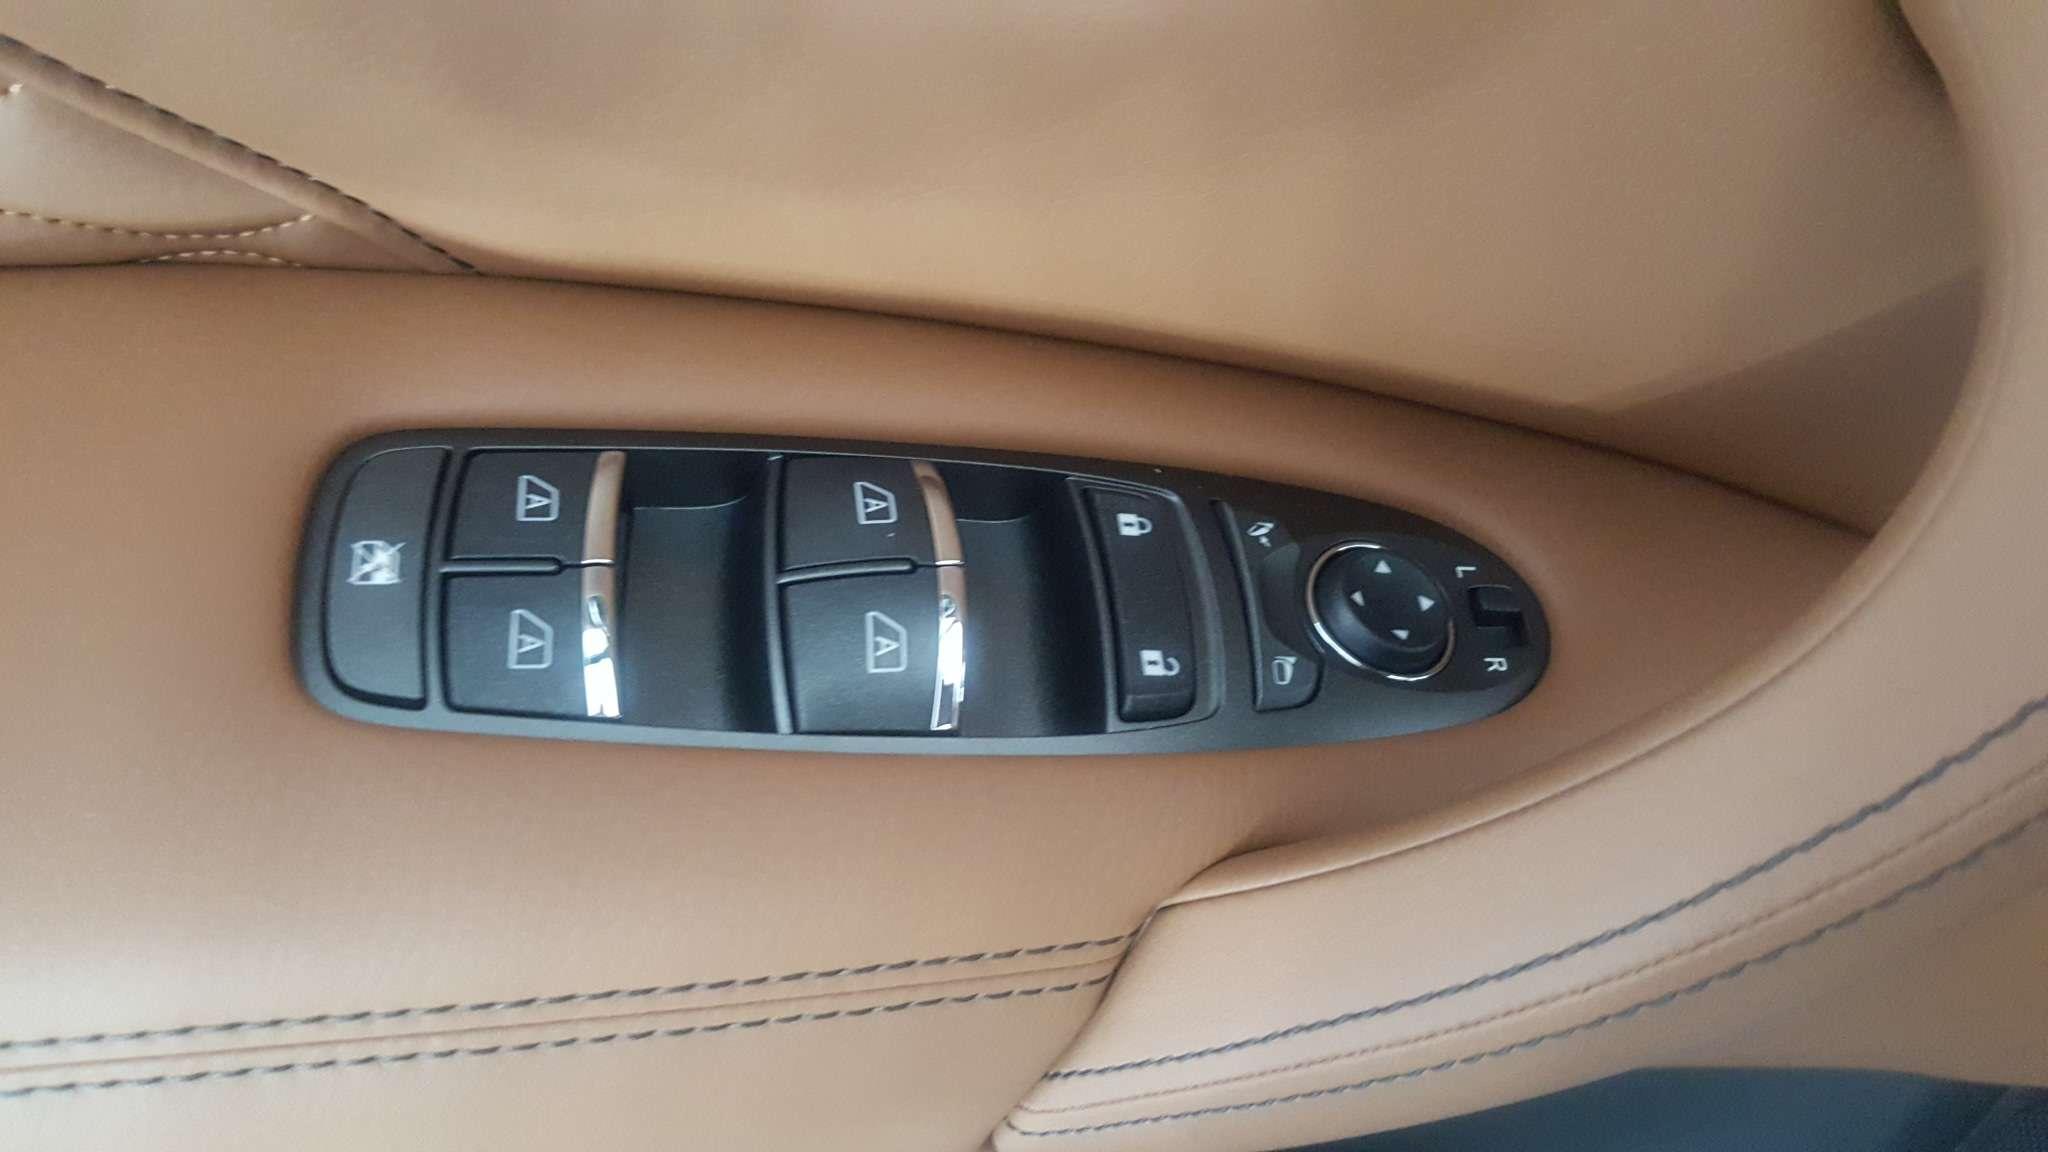 Buick Enclave Hvac Reset